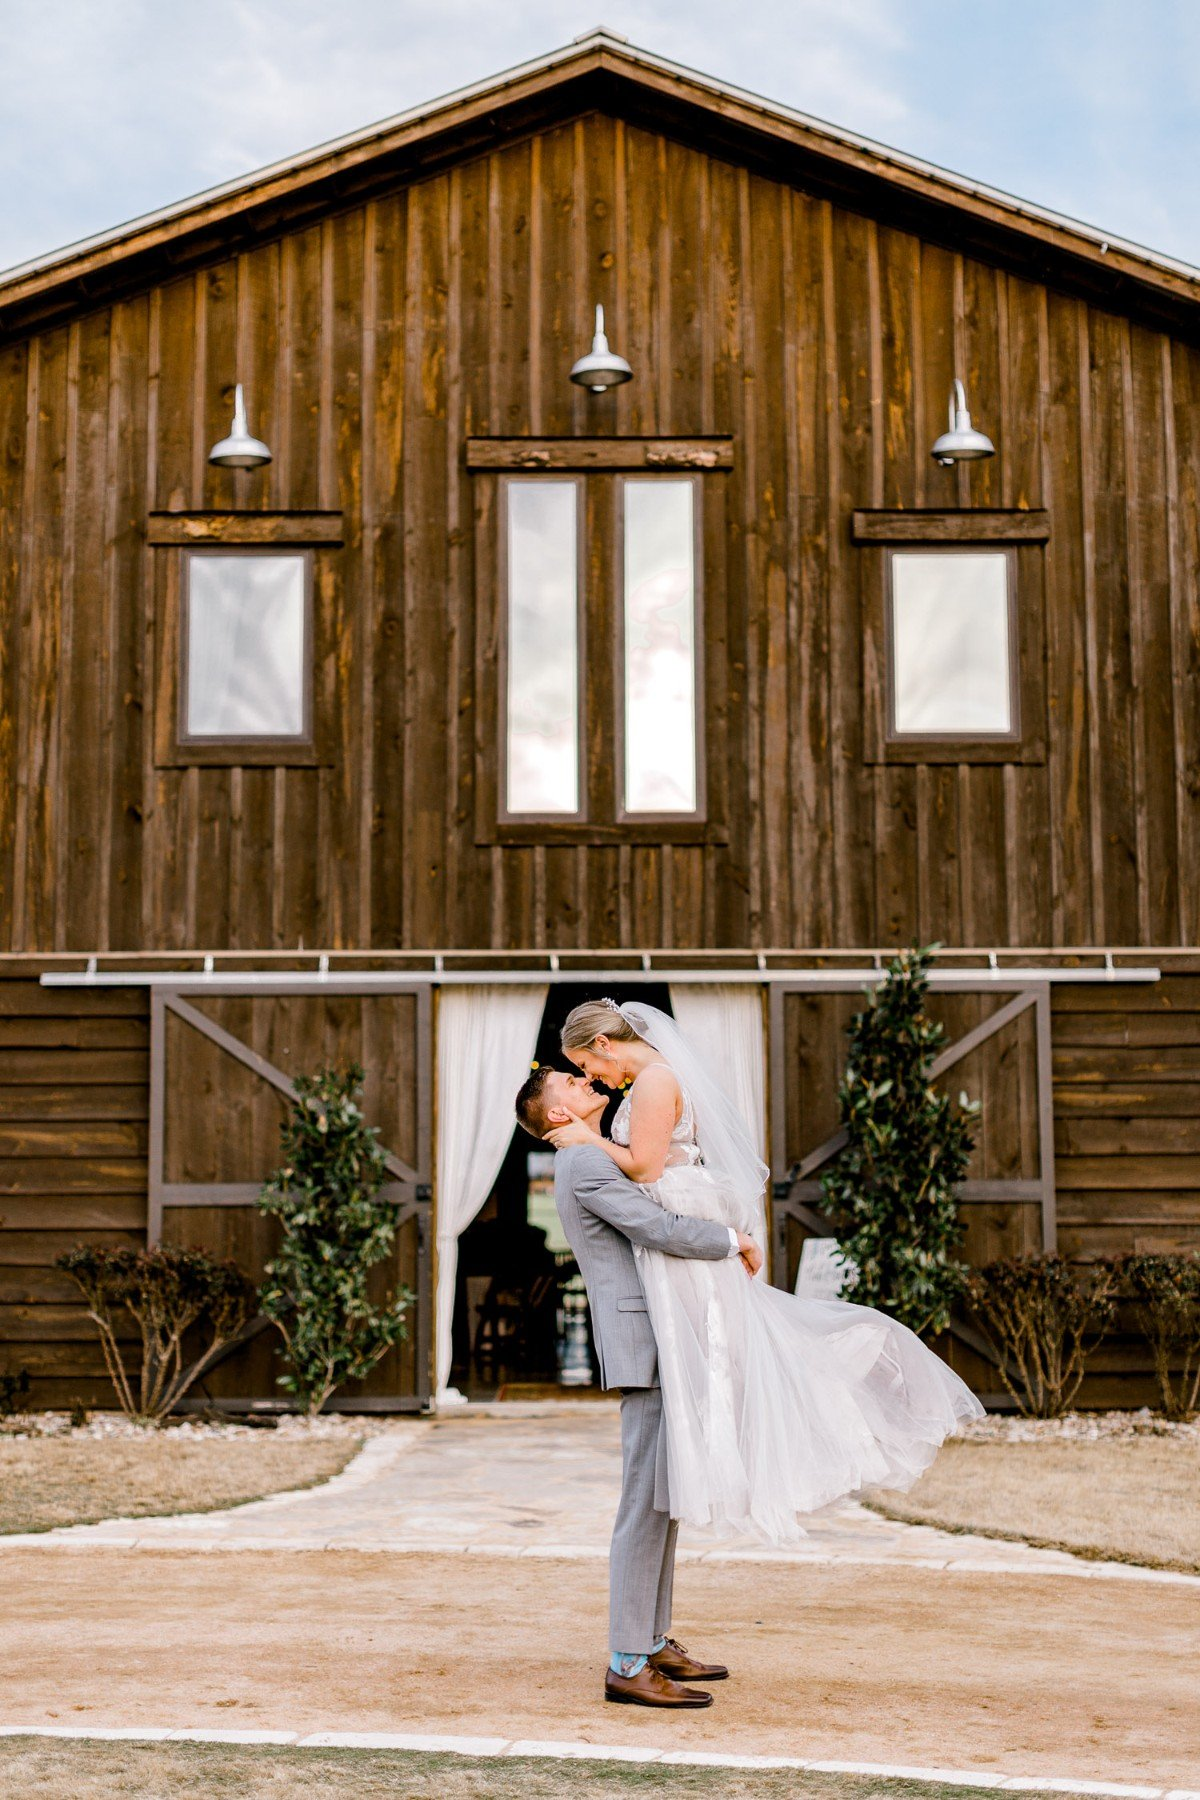 ennis-texas-wedding-photographer-kaitlyn-bullard-108.jpg